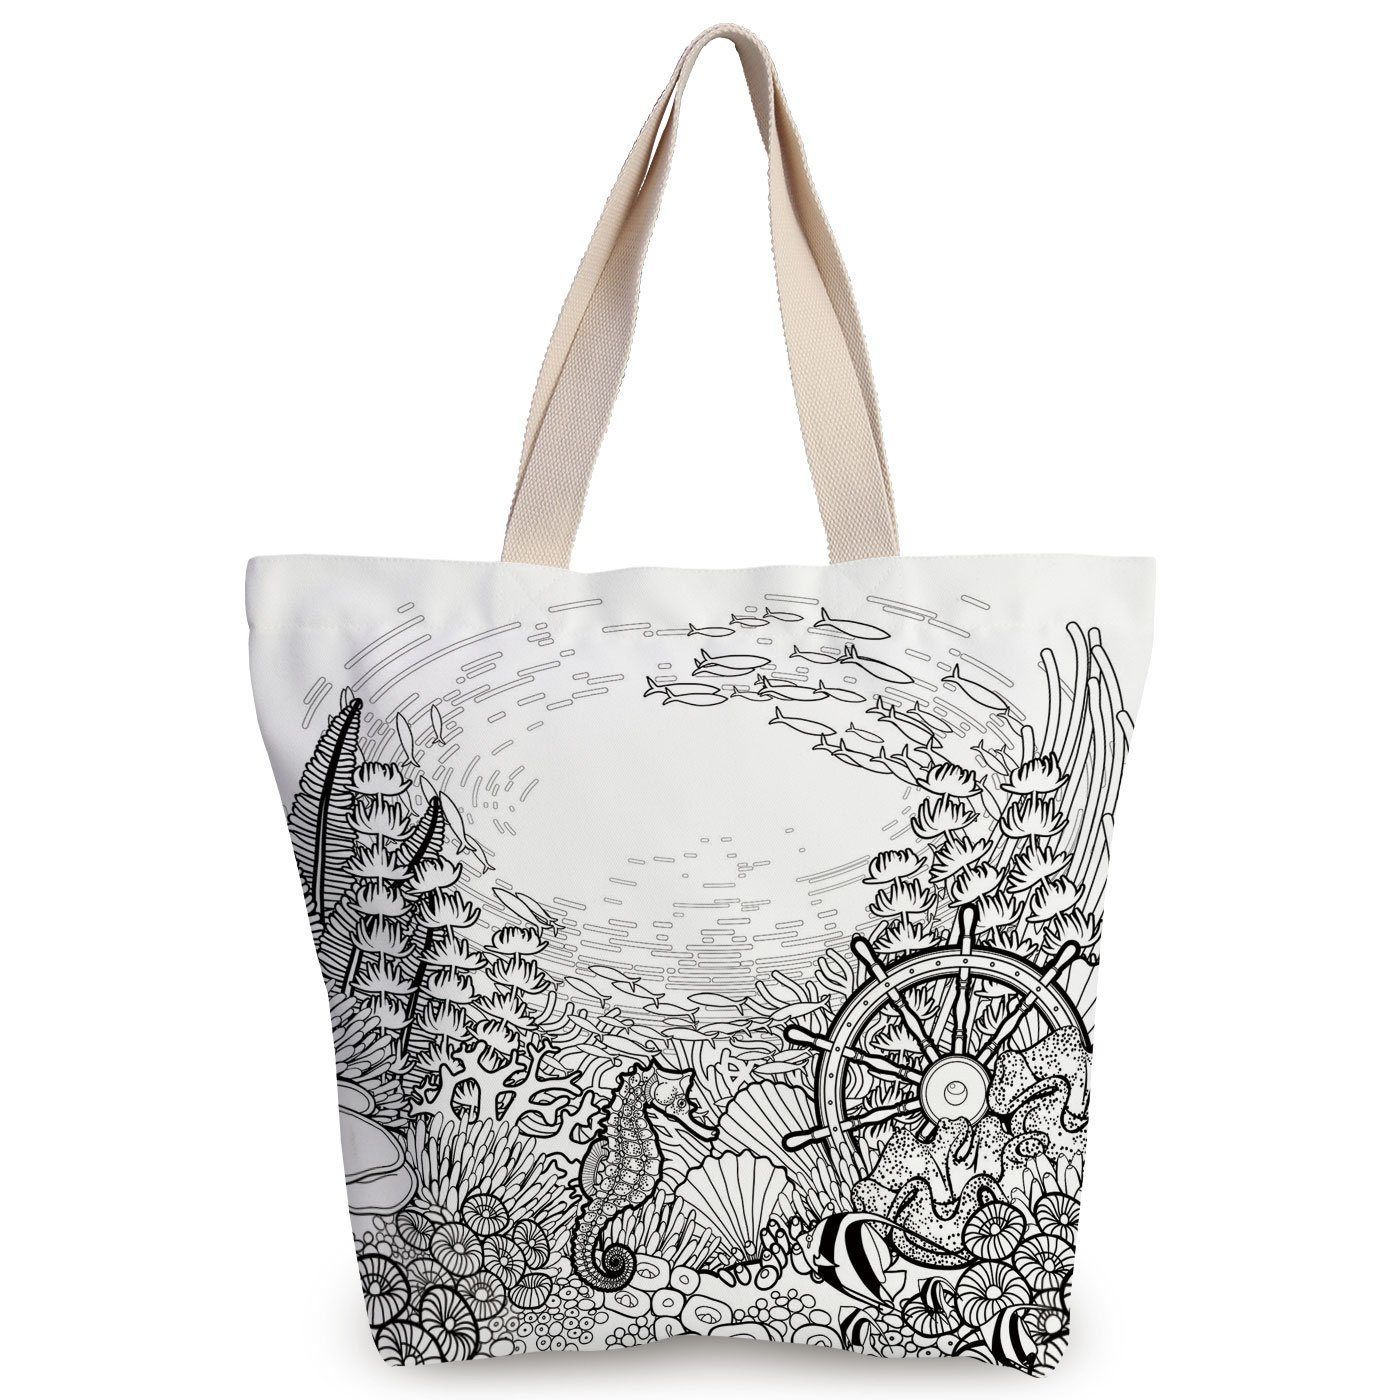 1400x1400 Personalized Canvas Tote Bag,aquarium,graphic Coral